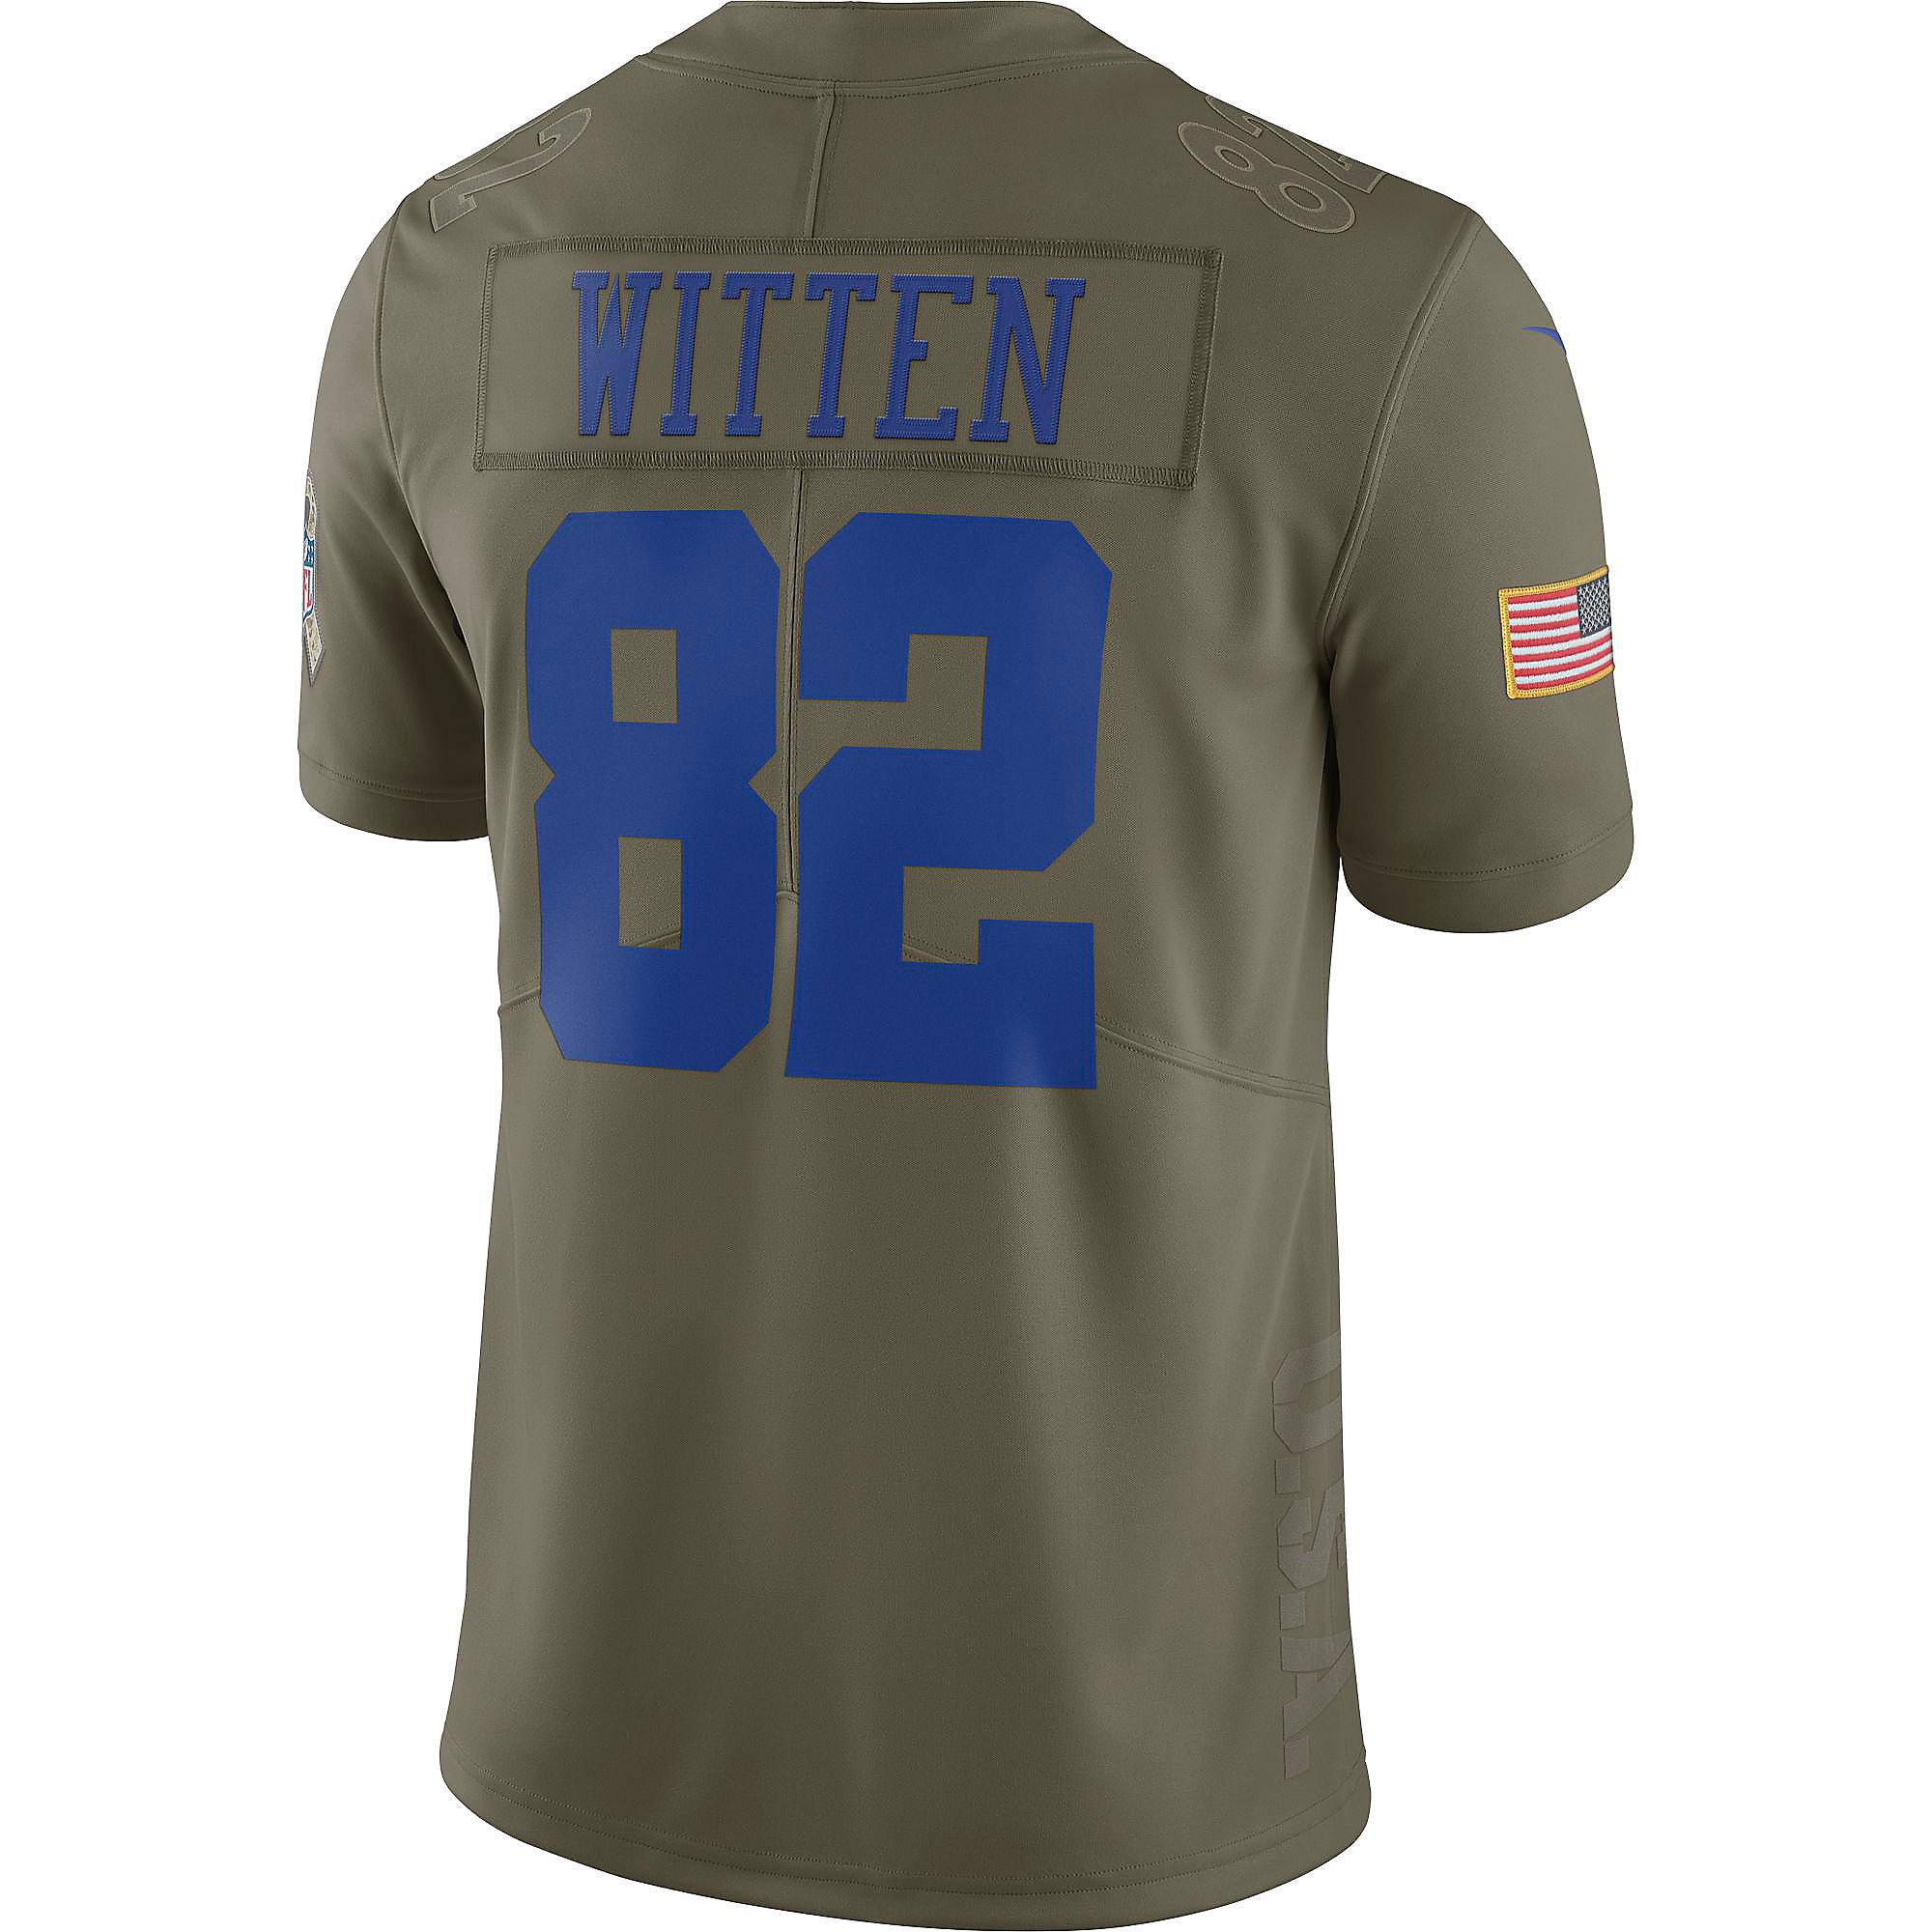 buy popular 596b1 bce0a Dallas Cowboys Jason Witten #82 Nike Limited Salute To Service Jersey |  Dallas Cowboys Pro Shop